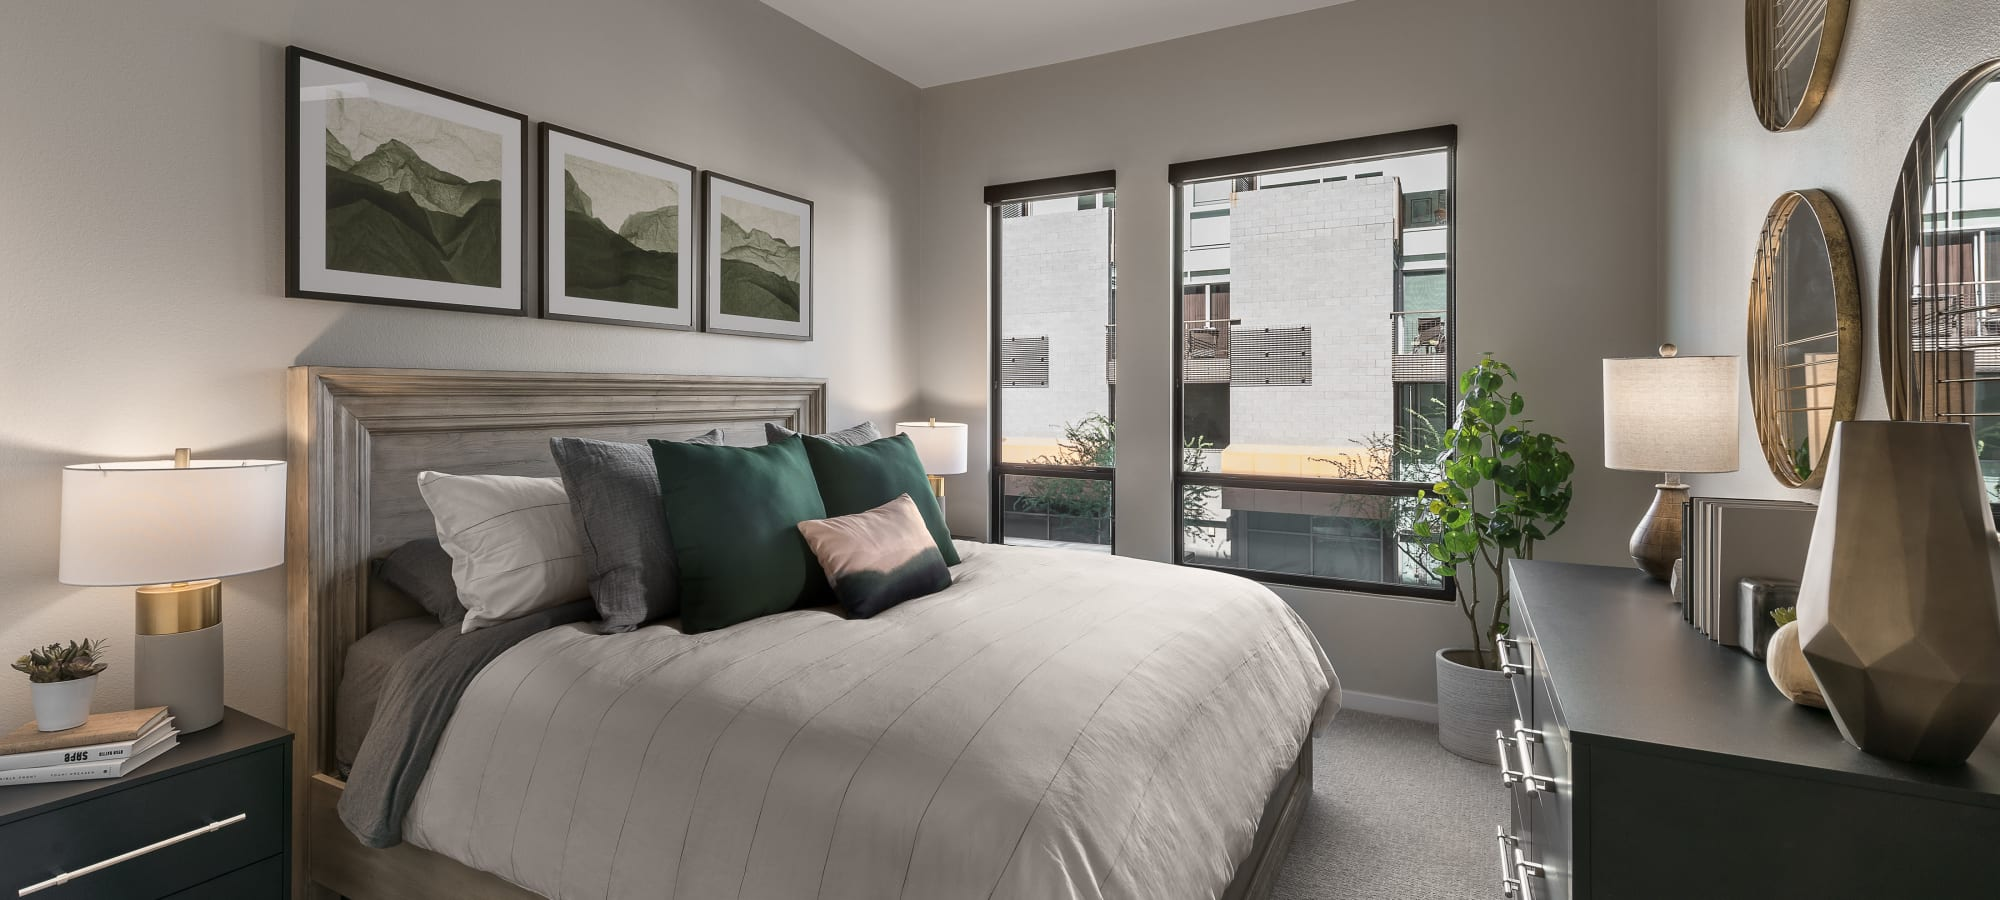 Lavish master bedroom at Gramercy Scottsdale in Scottsdale, Arizona